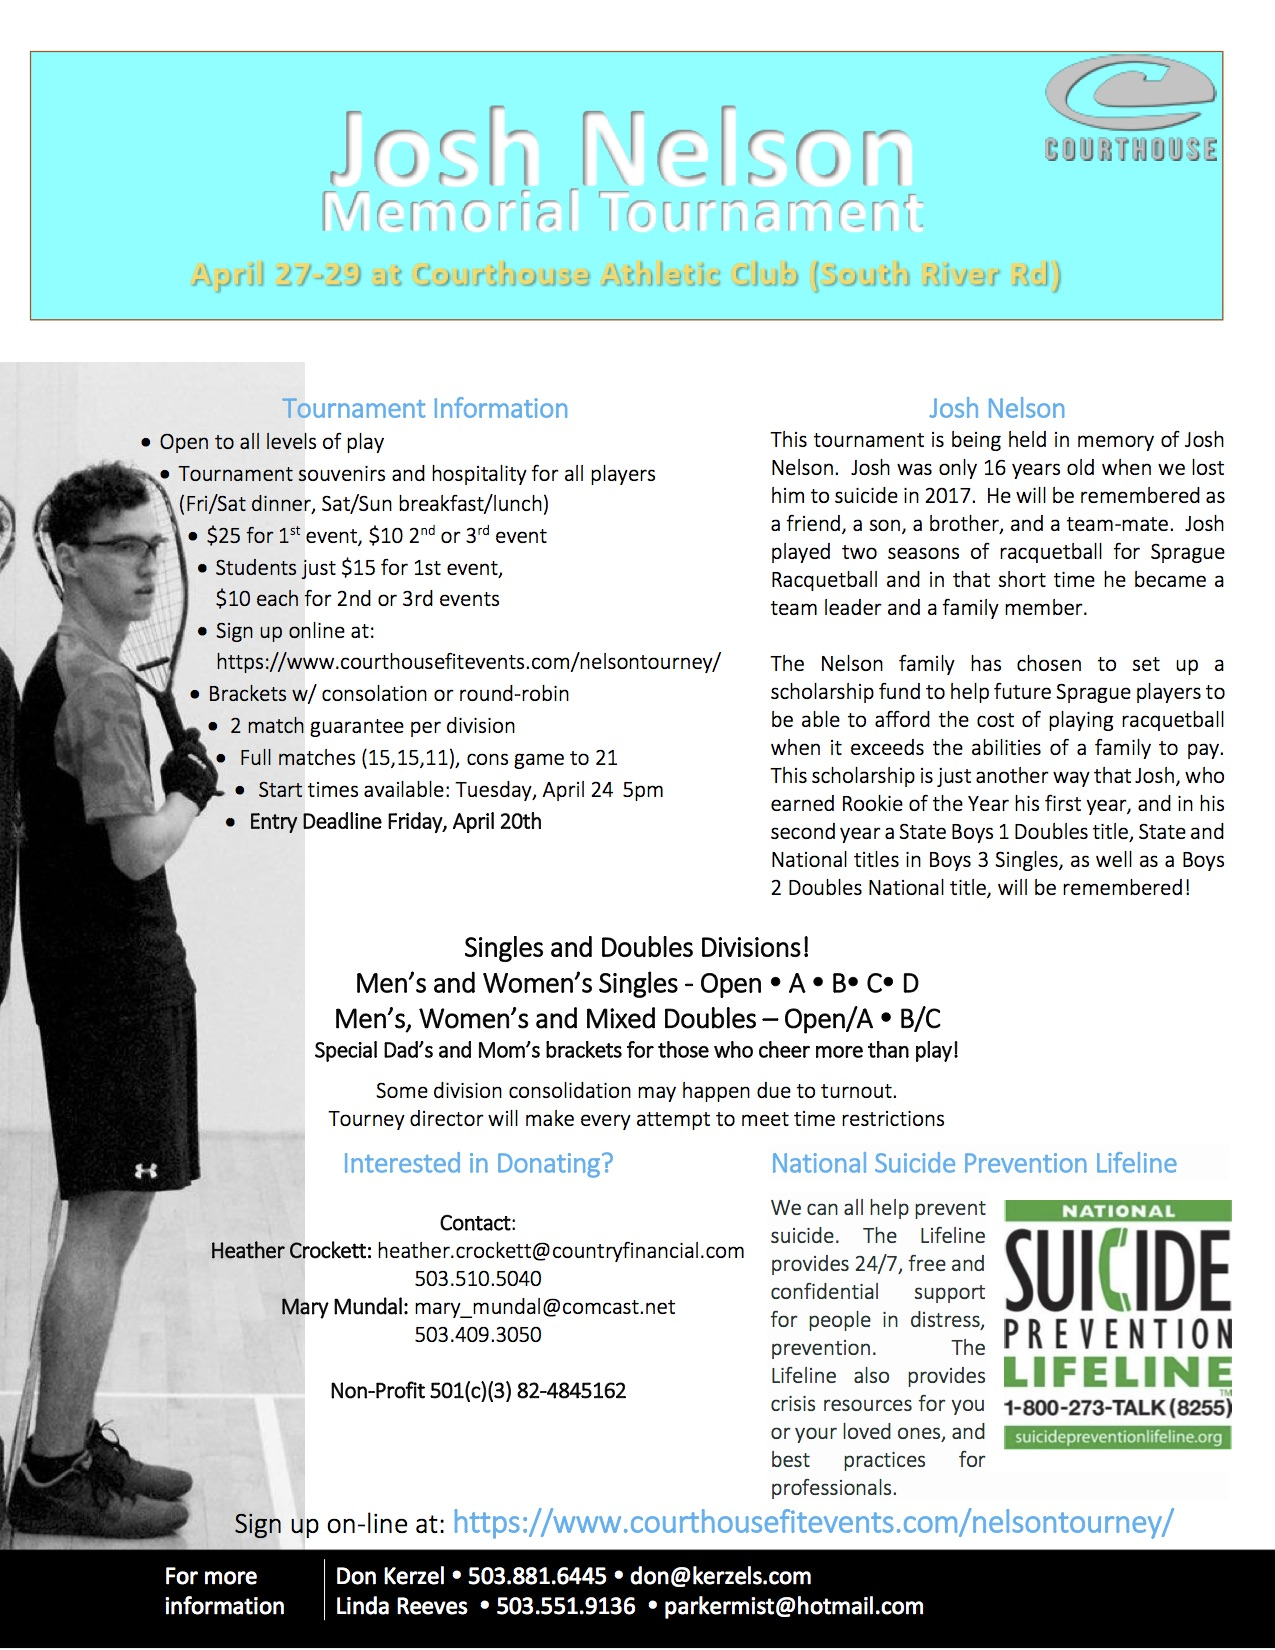 JNMT 2018 Tournament Flyer-3.jpg